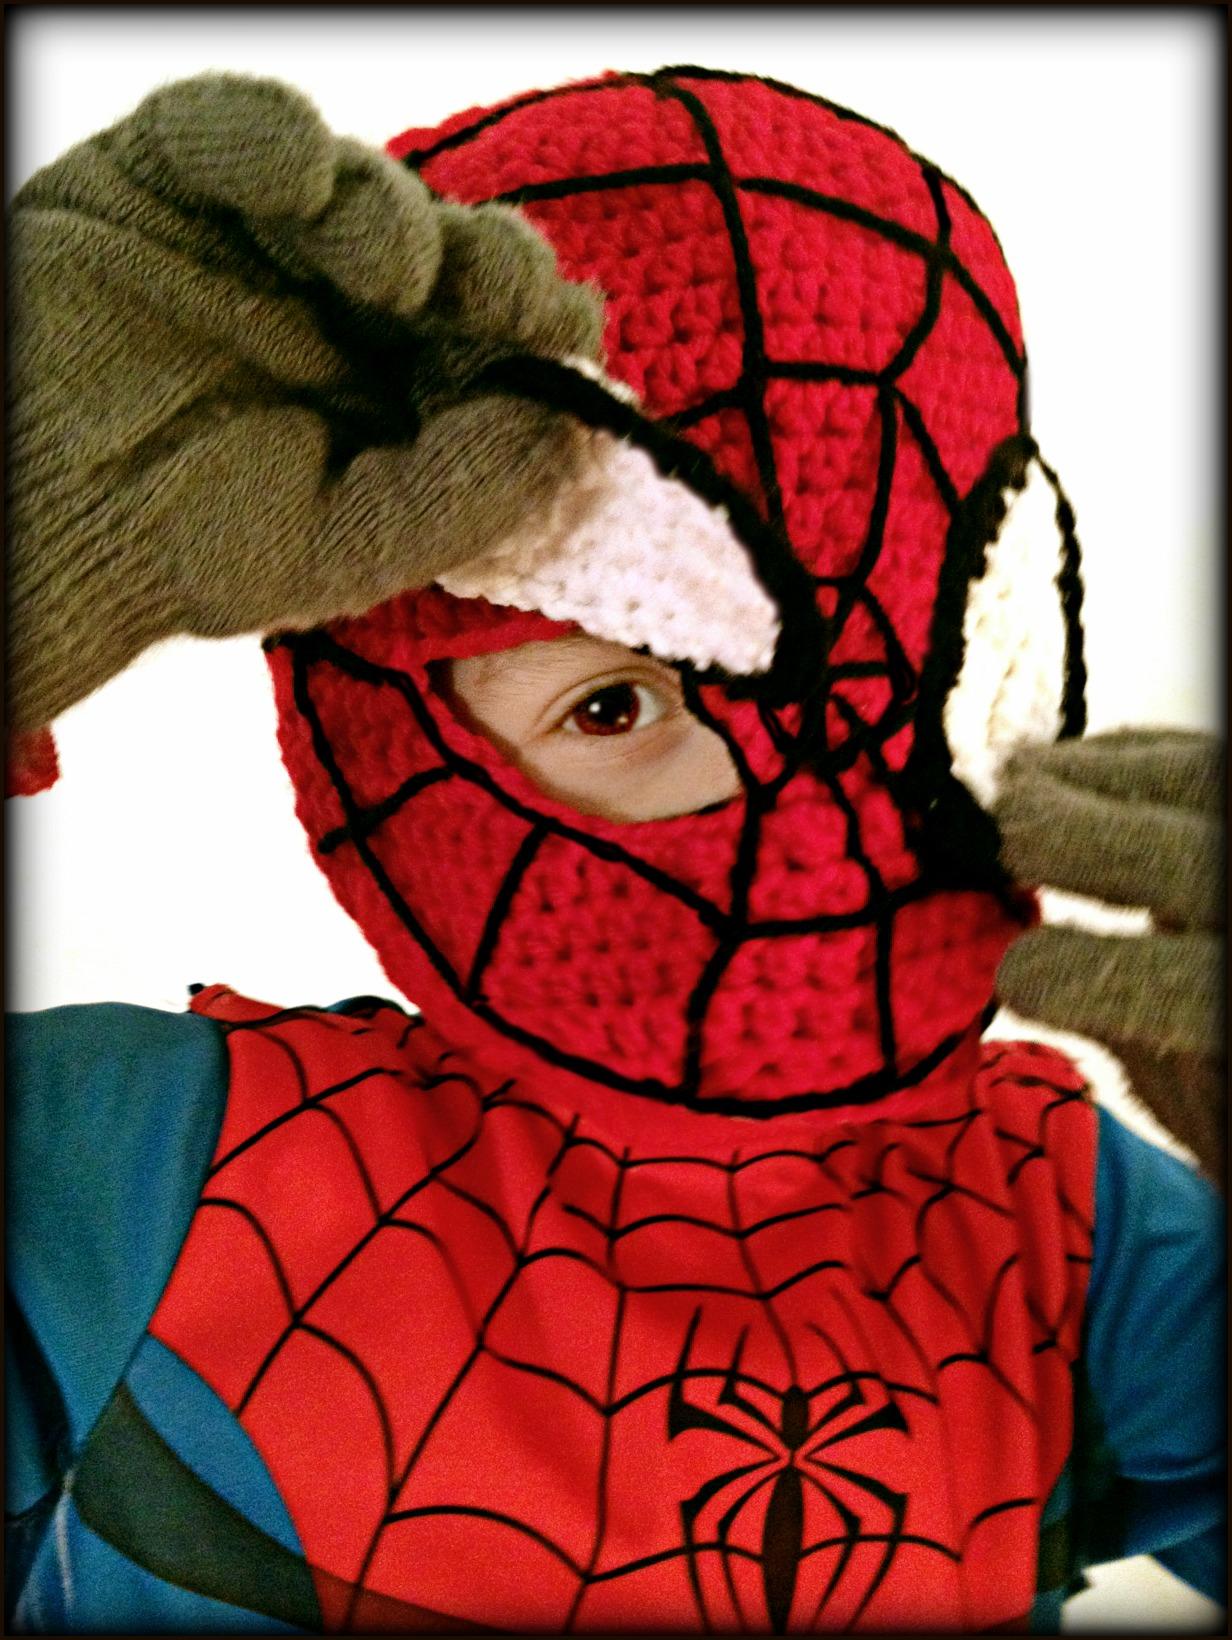 For My Superhero: Spiderman Mask | mellie blossom